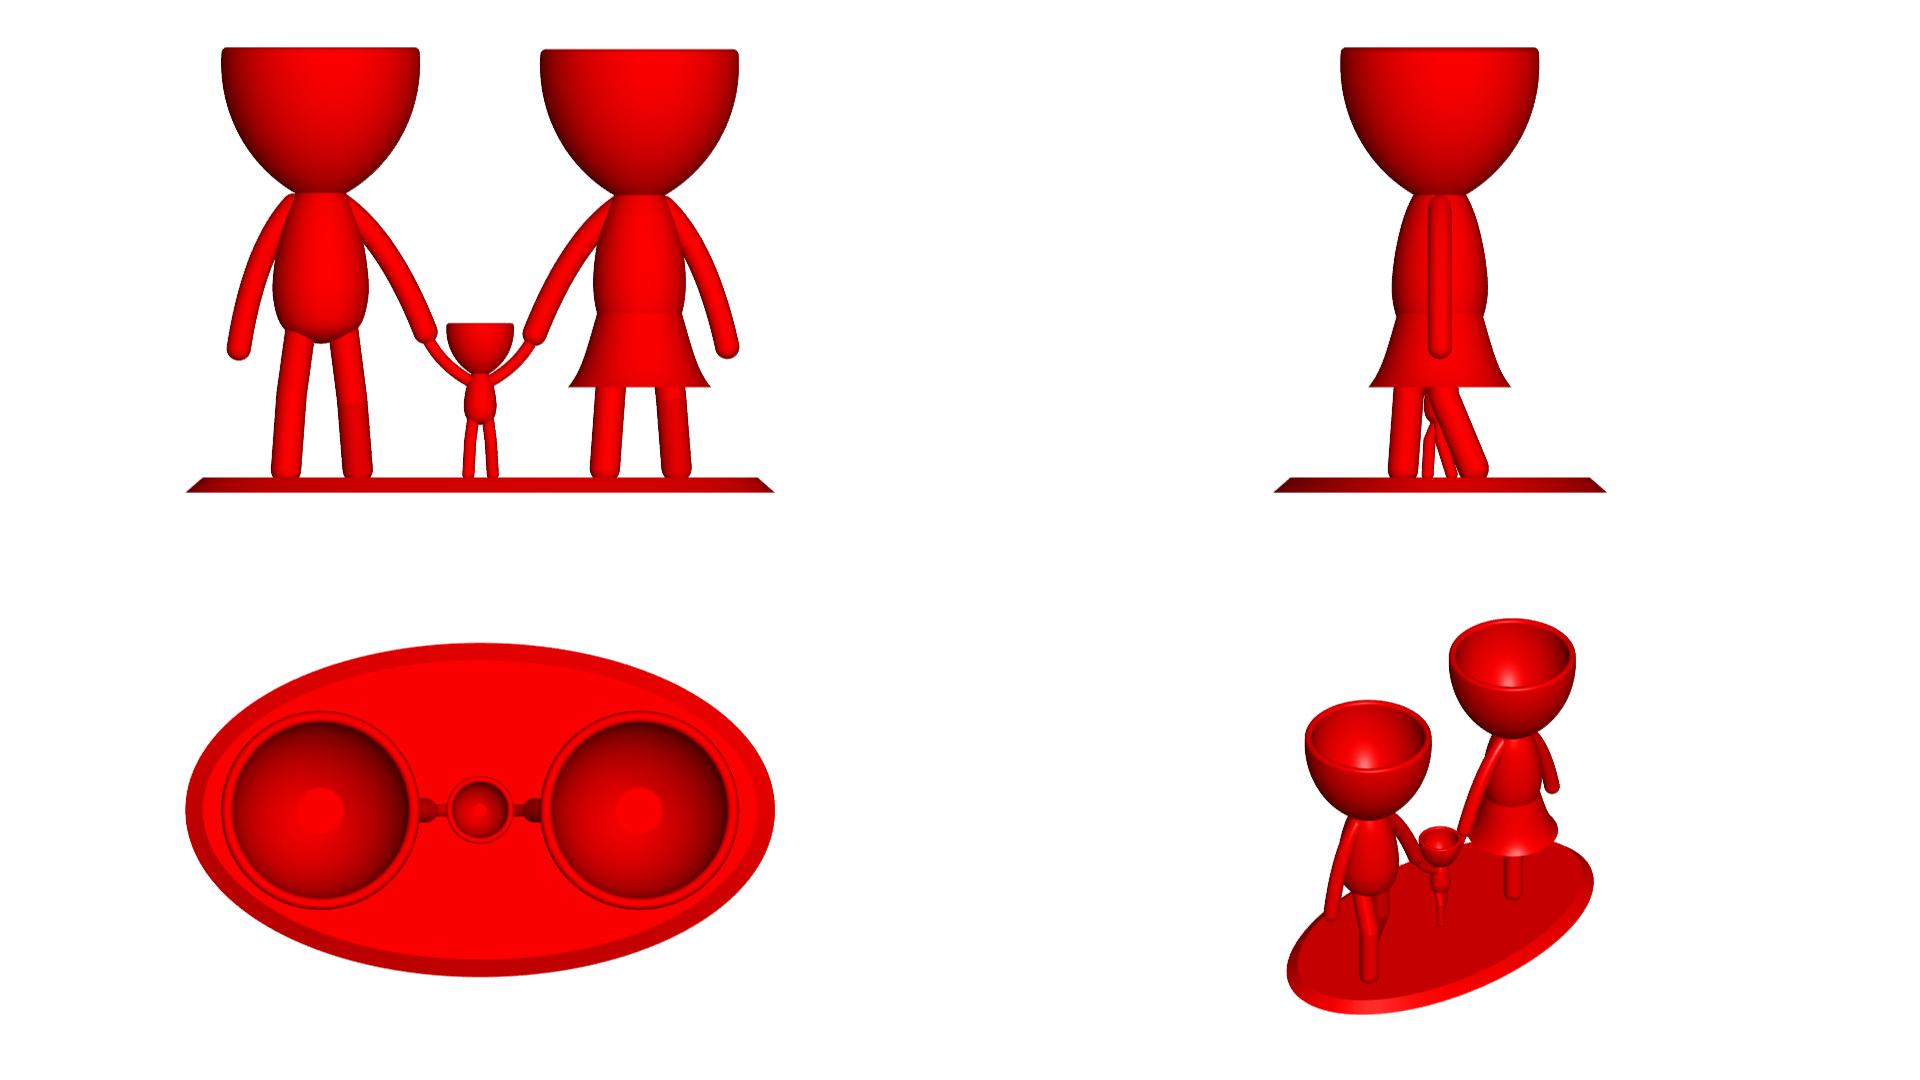 Familia_Rojo_2.png Download free STL file Macetas Florero ROBERT plant familia mama papa hijo - FAMILY FLOWERPOT VASE MOTHER DAD SON / DAUGHTER • 3D printable object, PRODUSTL56